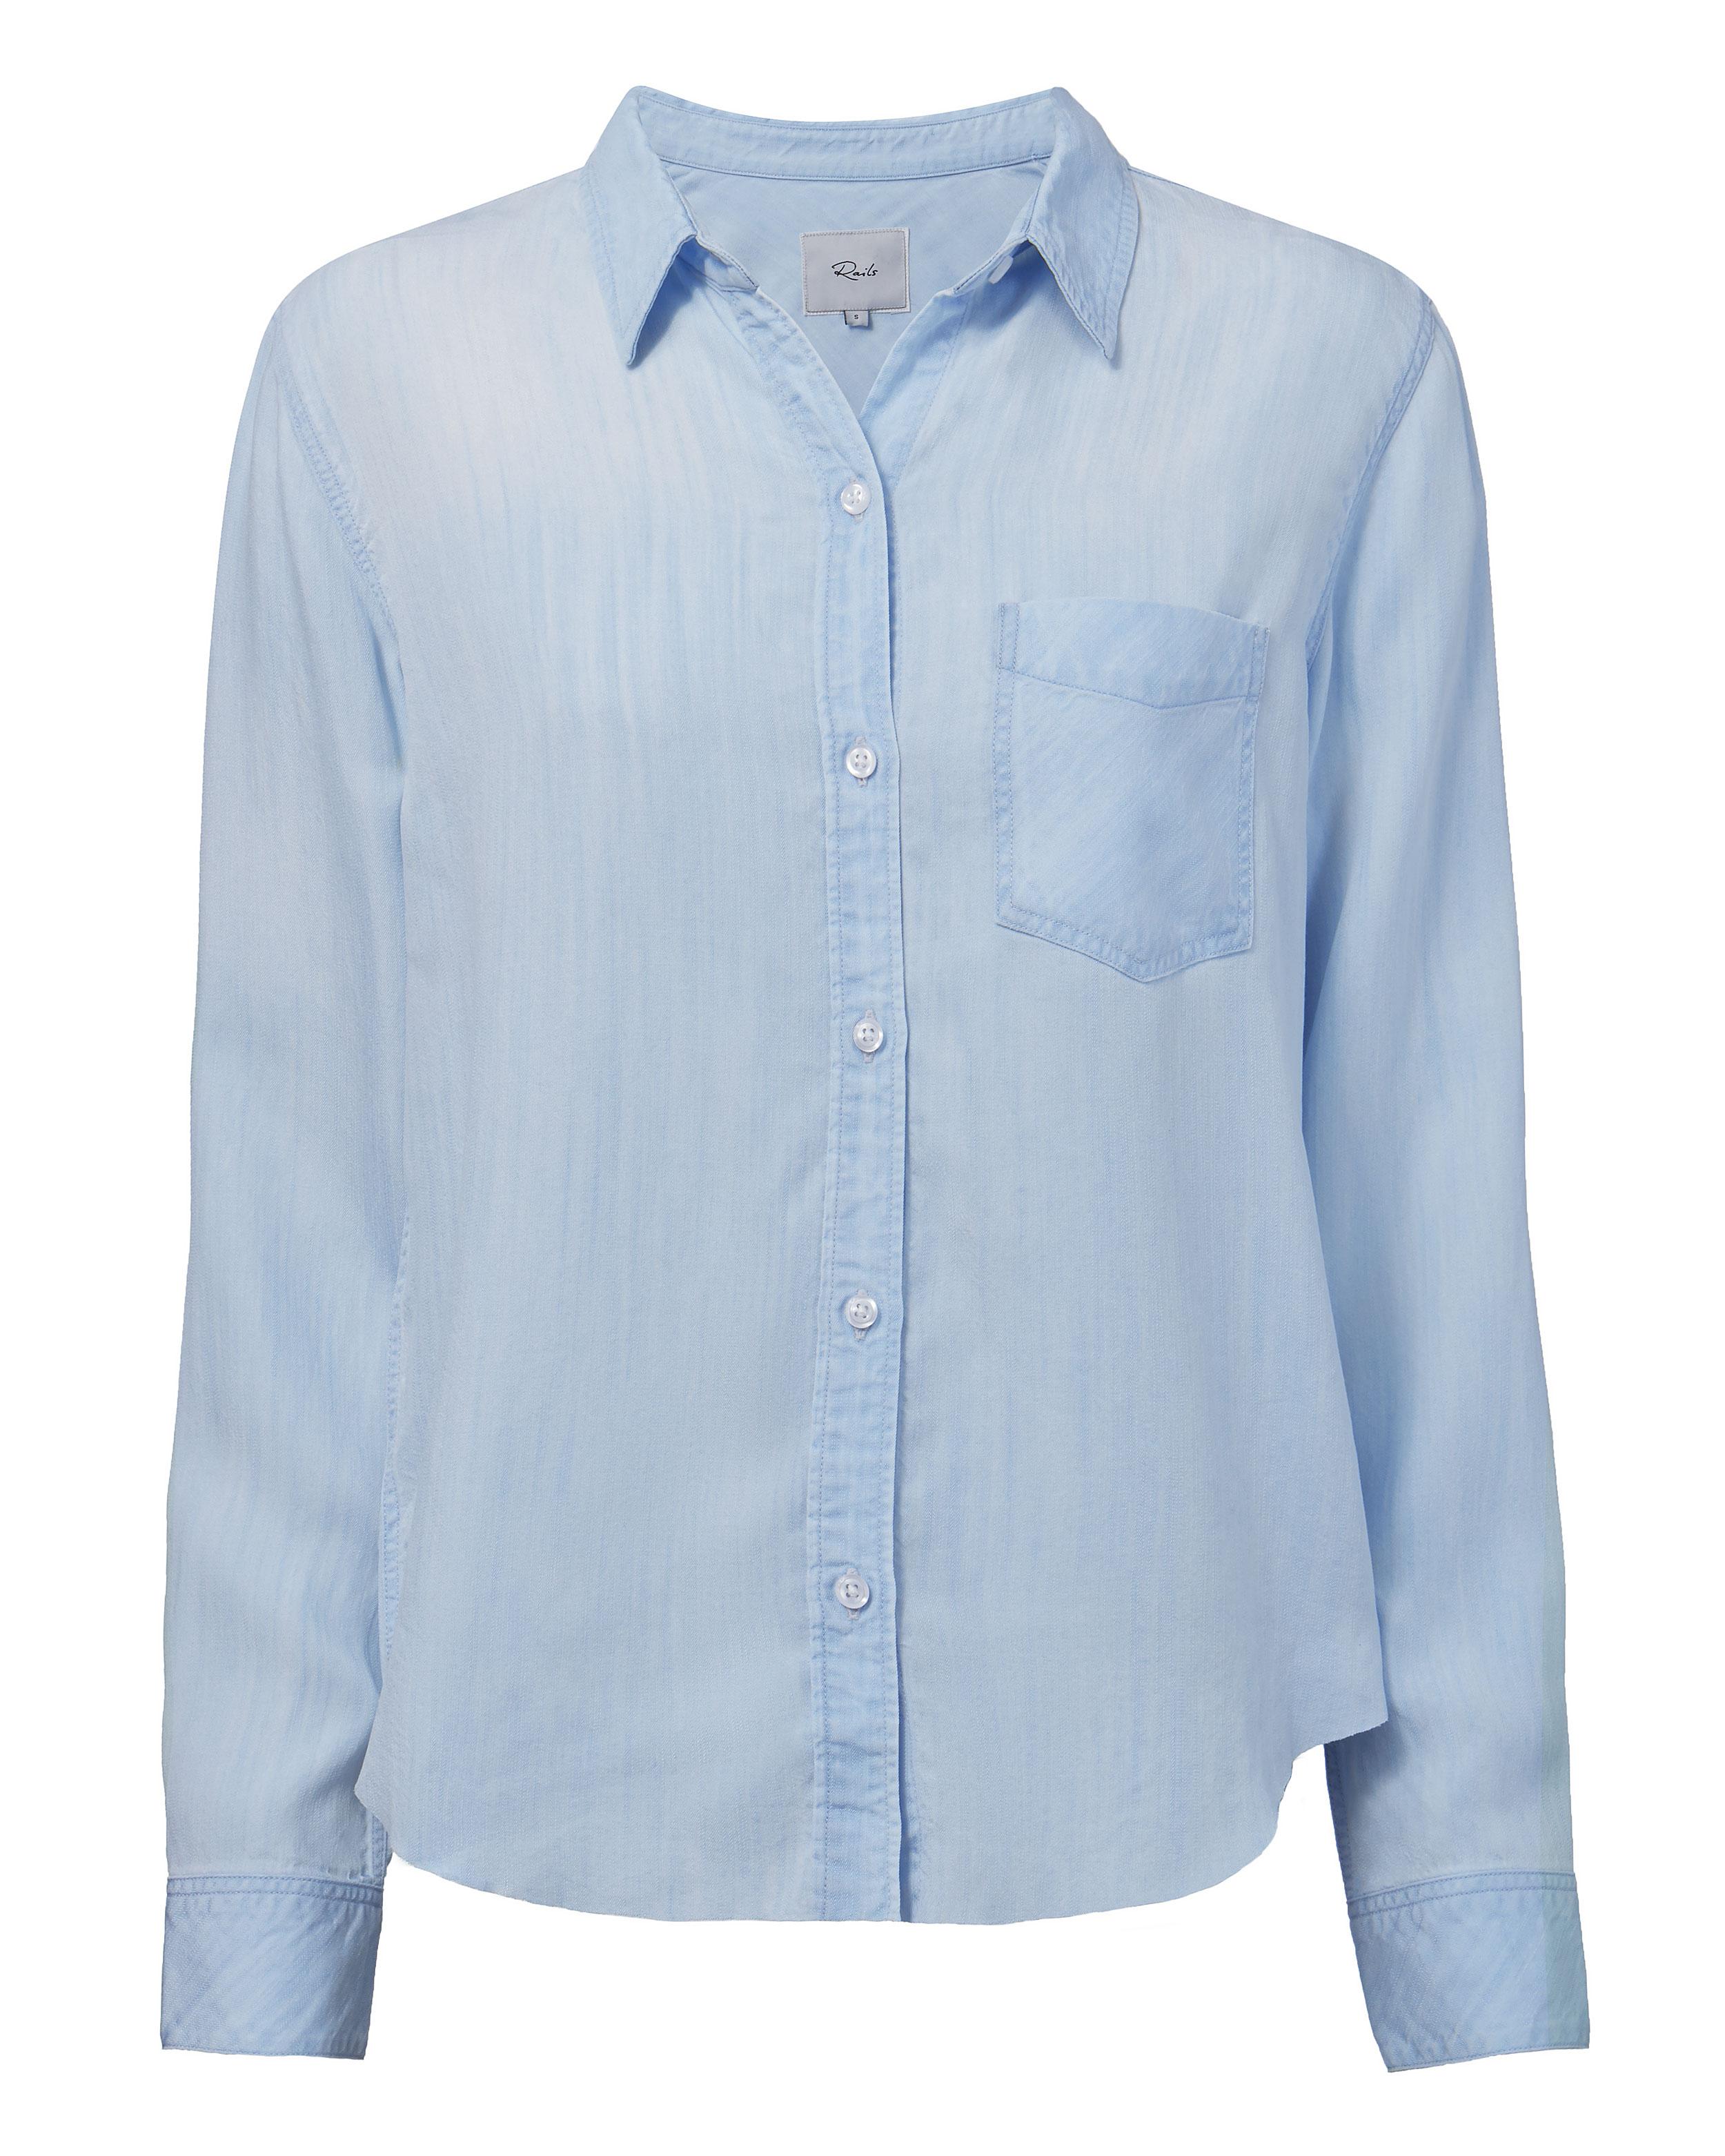 Ingrid Light Vintage Raw Hem Shirt by Rails